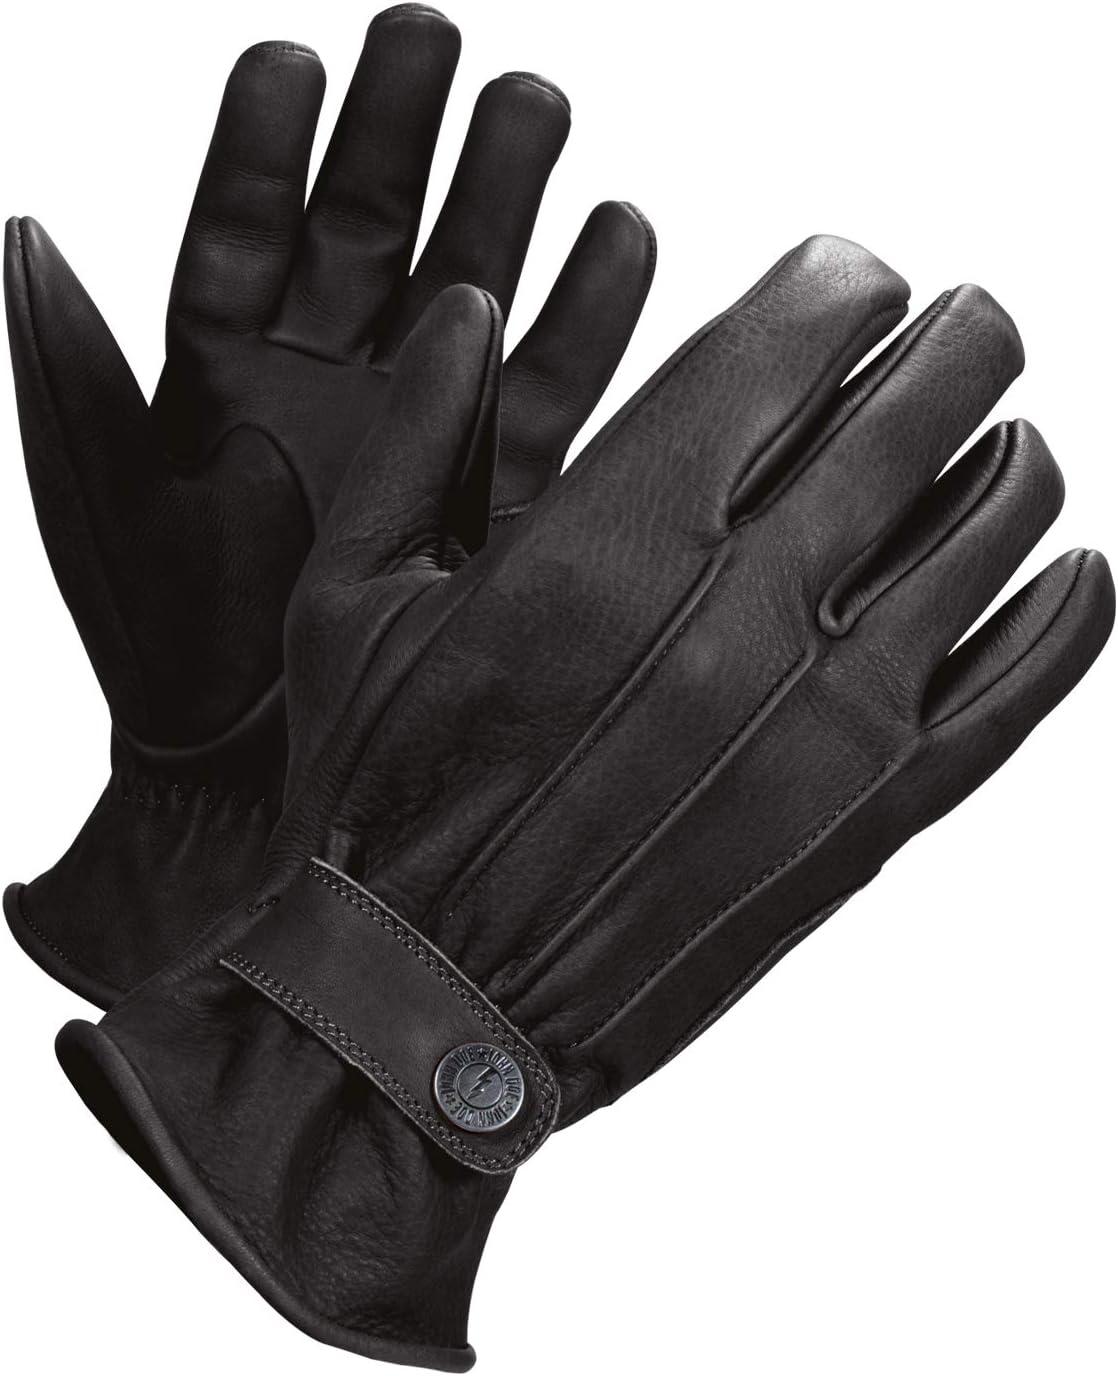 Atmungsaktiv Innenseite mit Kevlar John Doe Motorrad Handschuh Grinder Handschuh aus Rindsleder